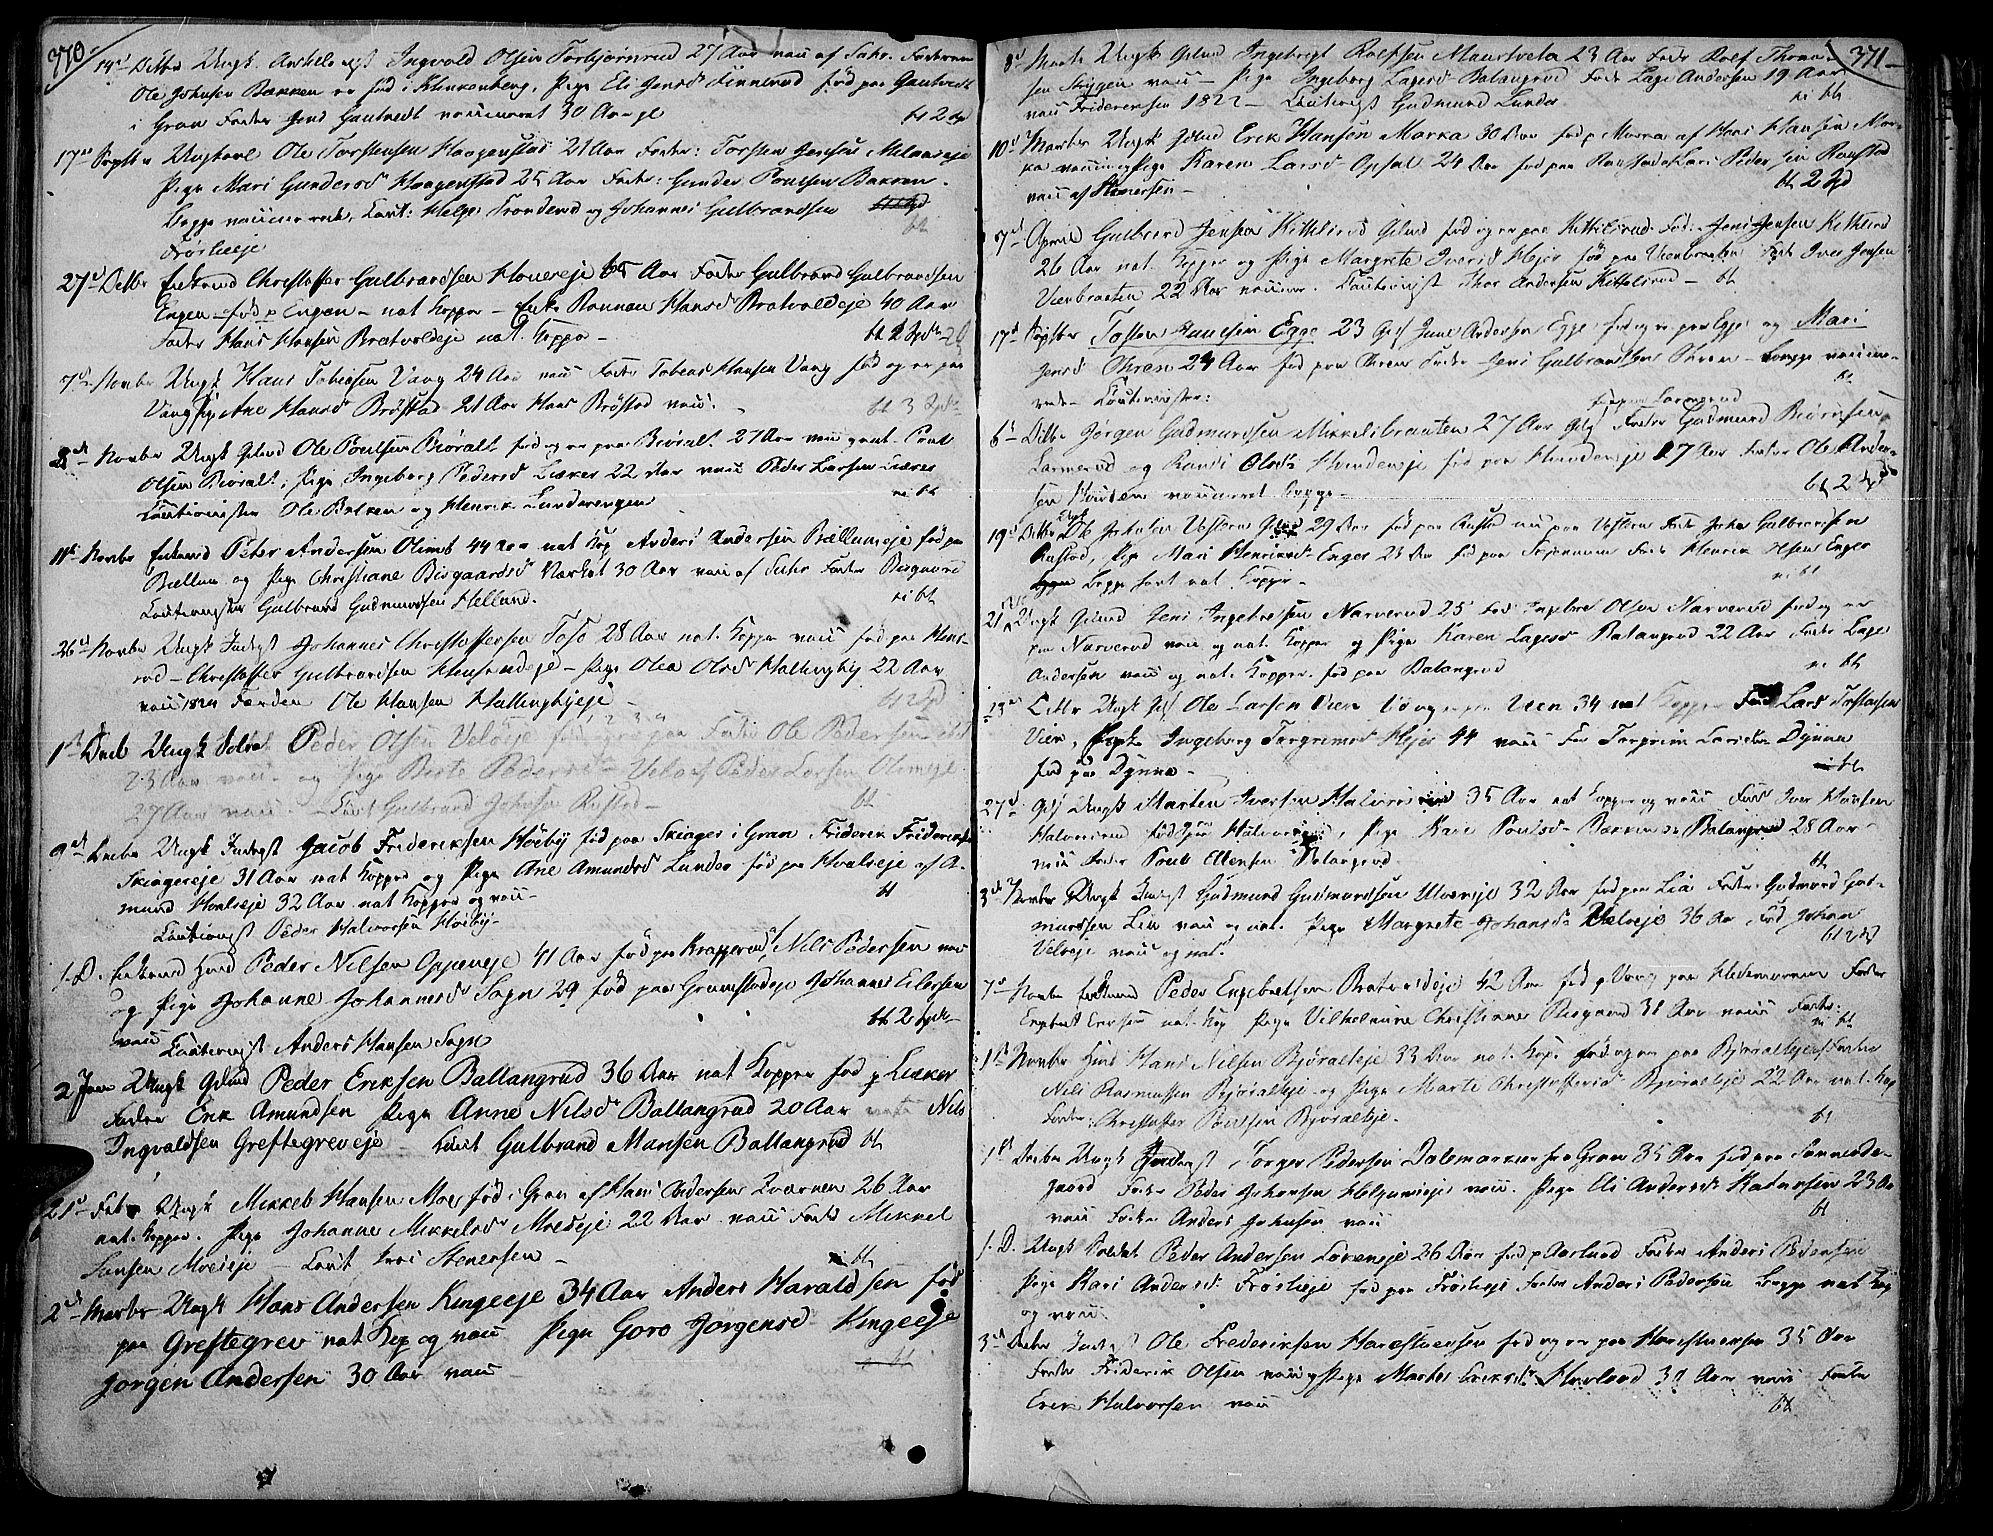 SAH, Jevnaker prestekontor, Ministerialbok nr. 4, 1800-1861, s. 370-371